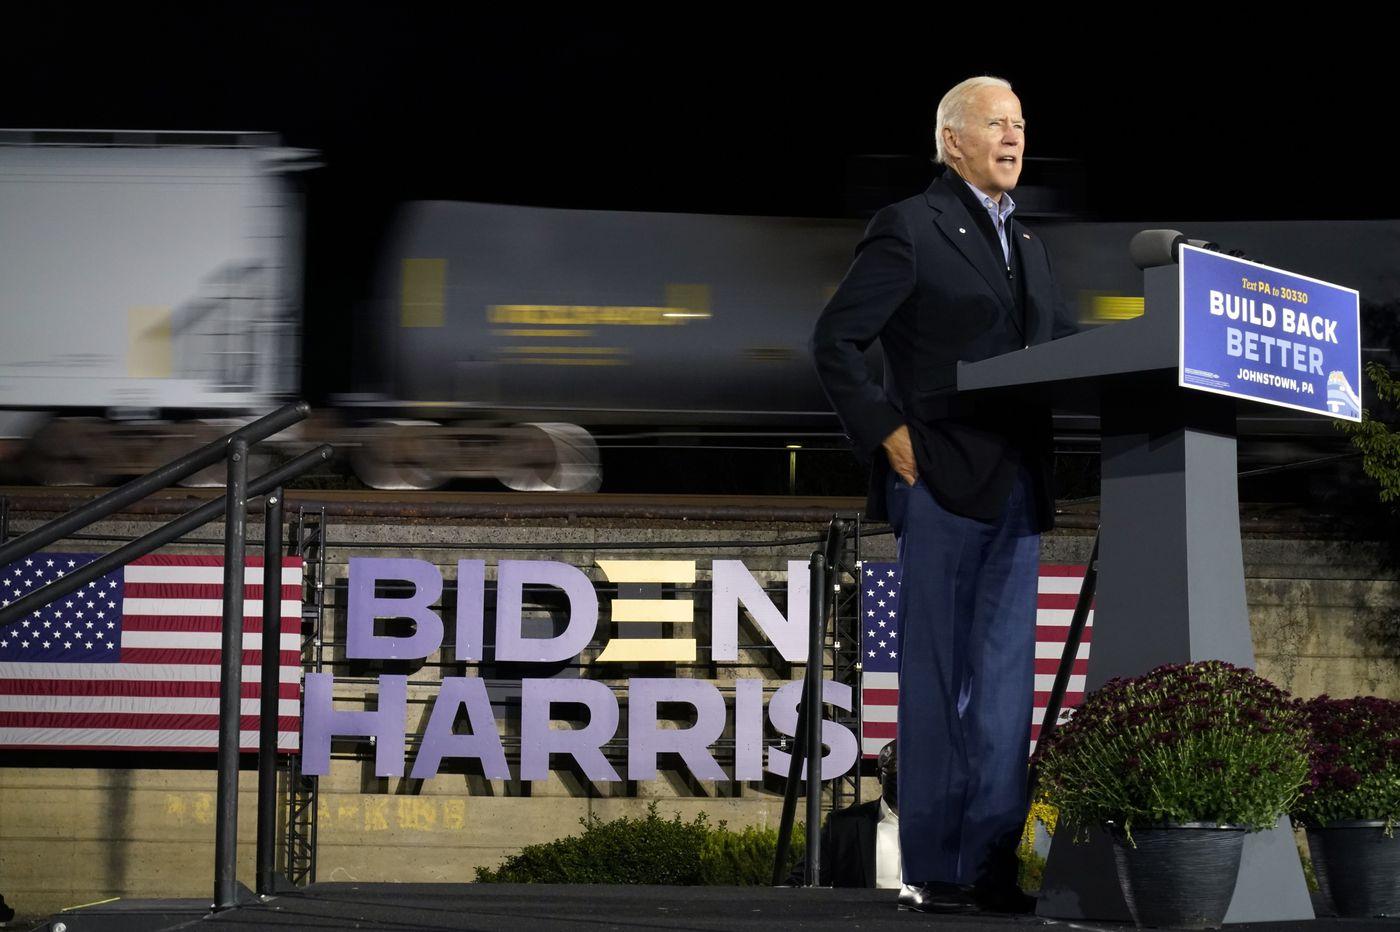 PG2T5J2HYNDK3NL2QQBFVVHLY4 - Joe Biden the railroad President